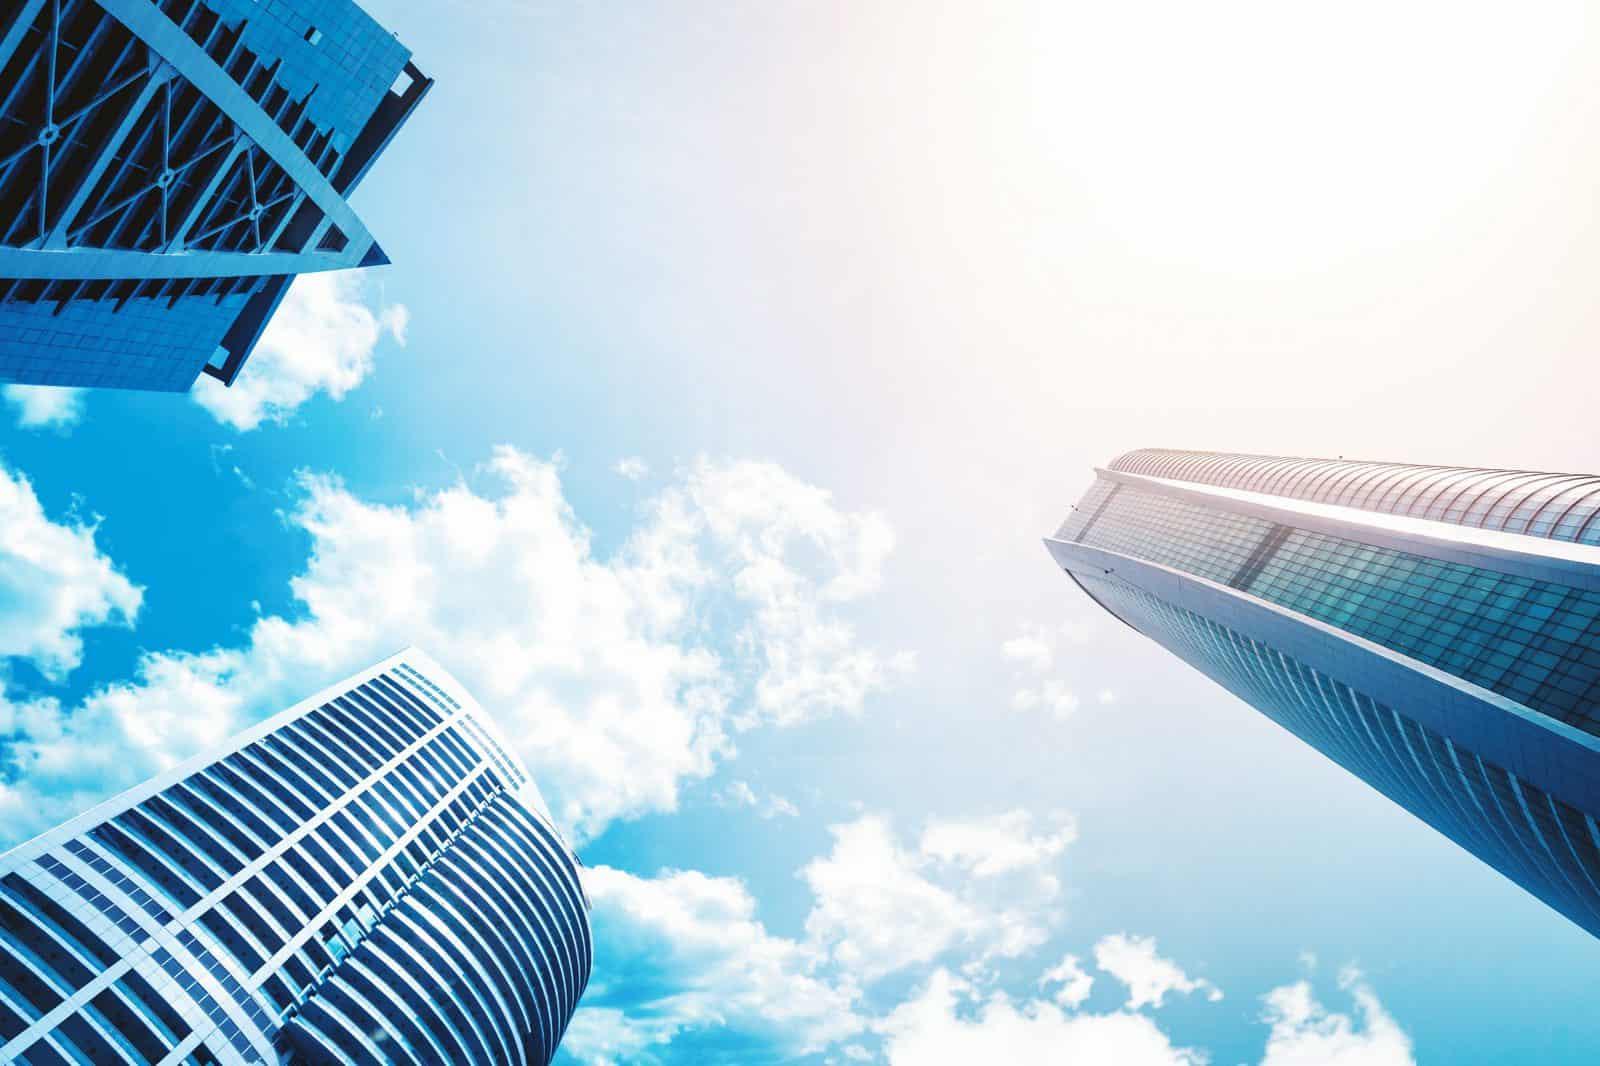 Business building, skyscraper looking up